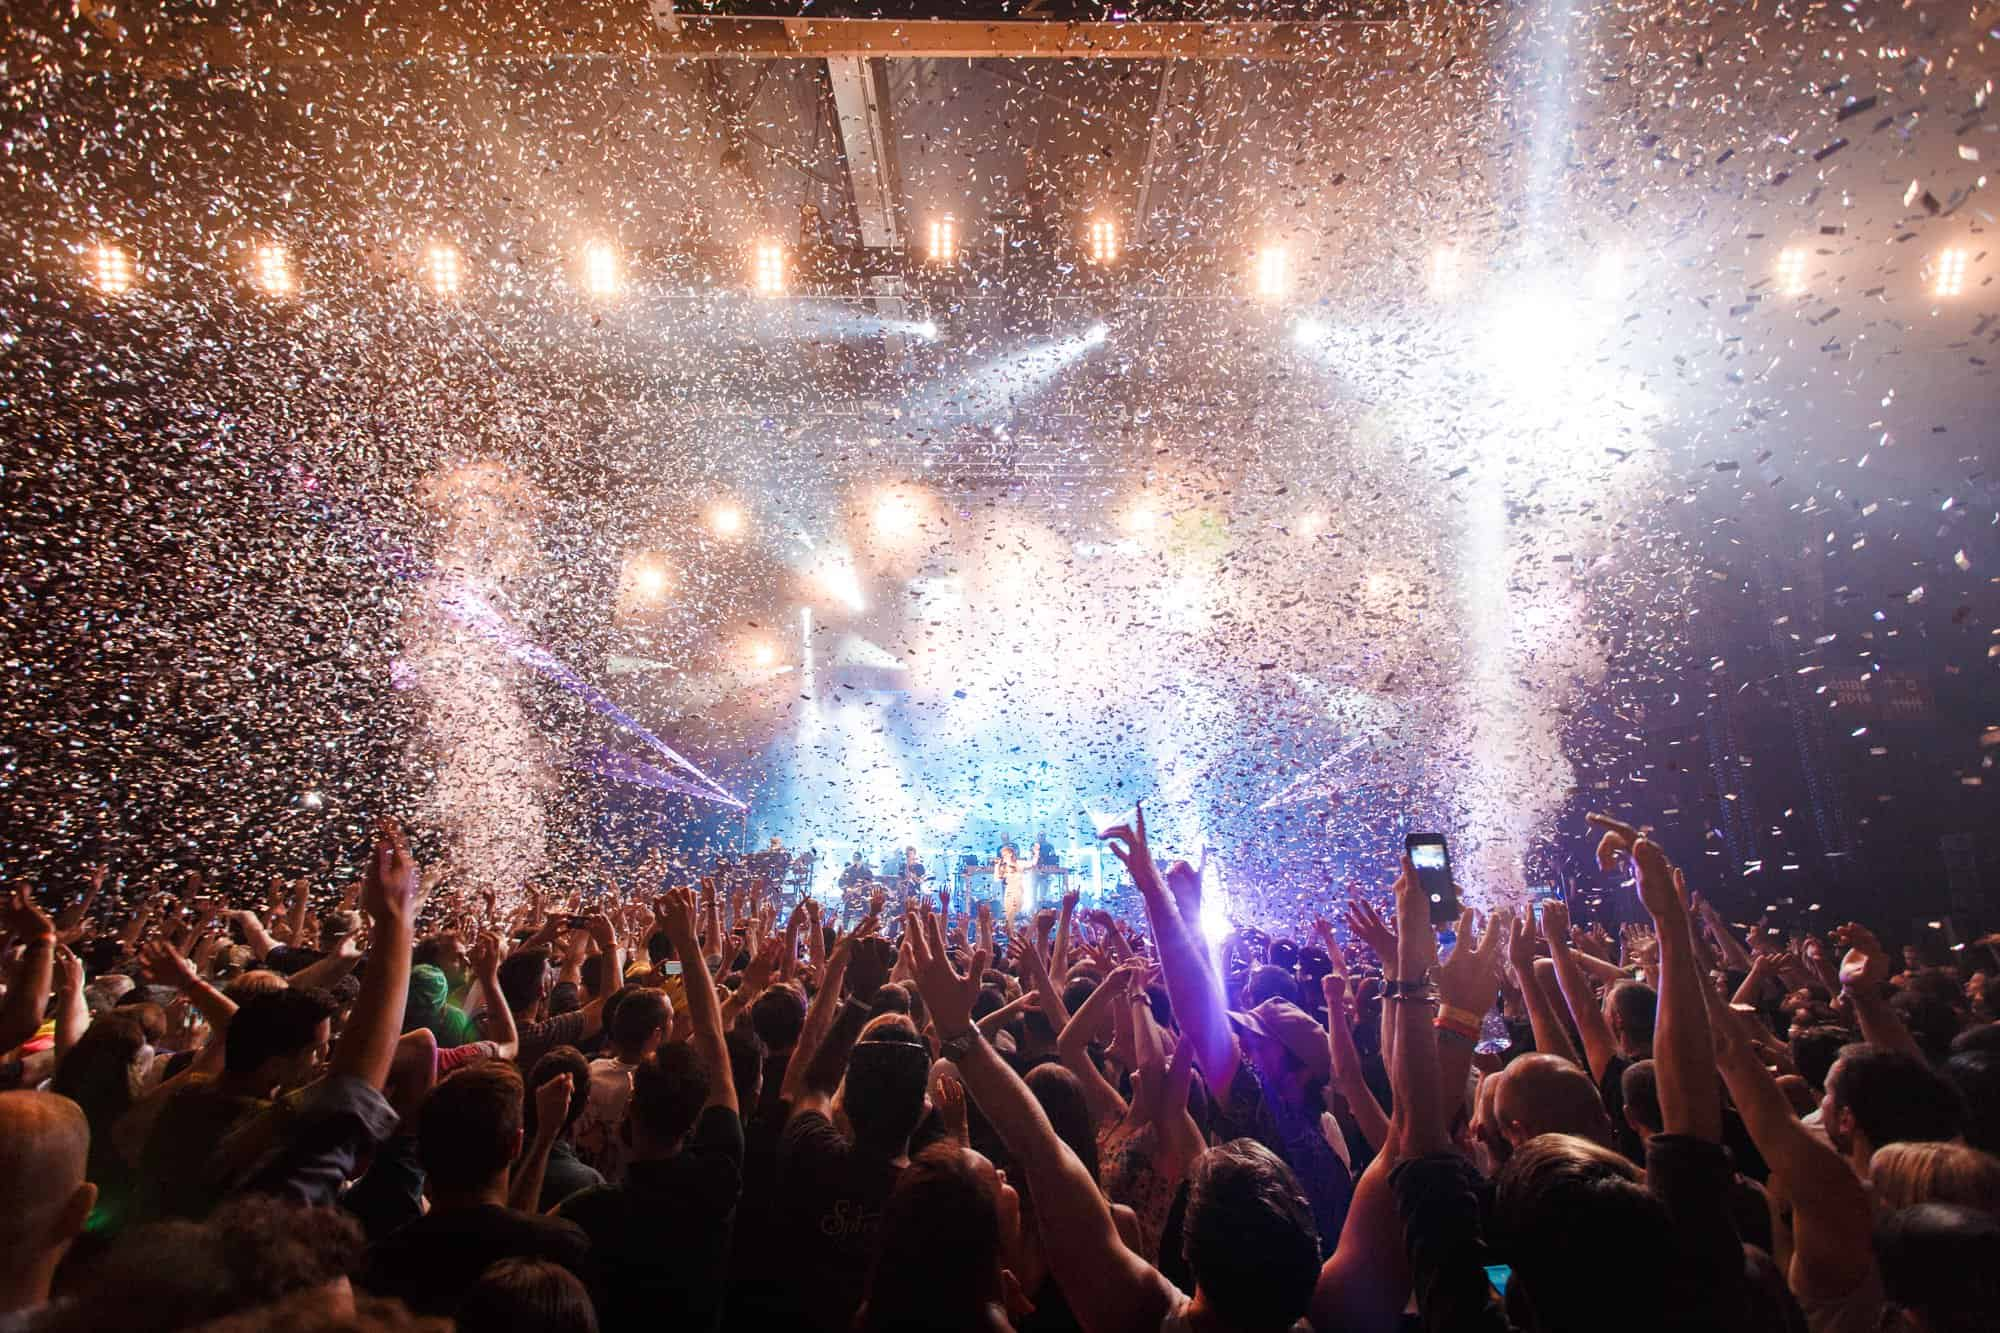 Sónar 2017 en Barcelona – Detalles del Festival y Hoteles Donde Alojarse